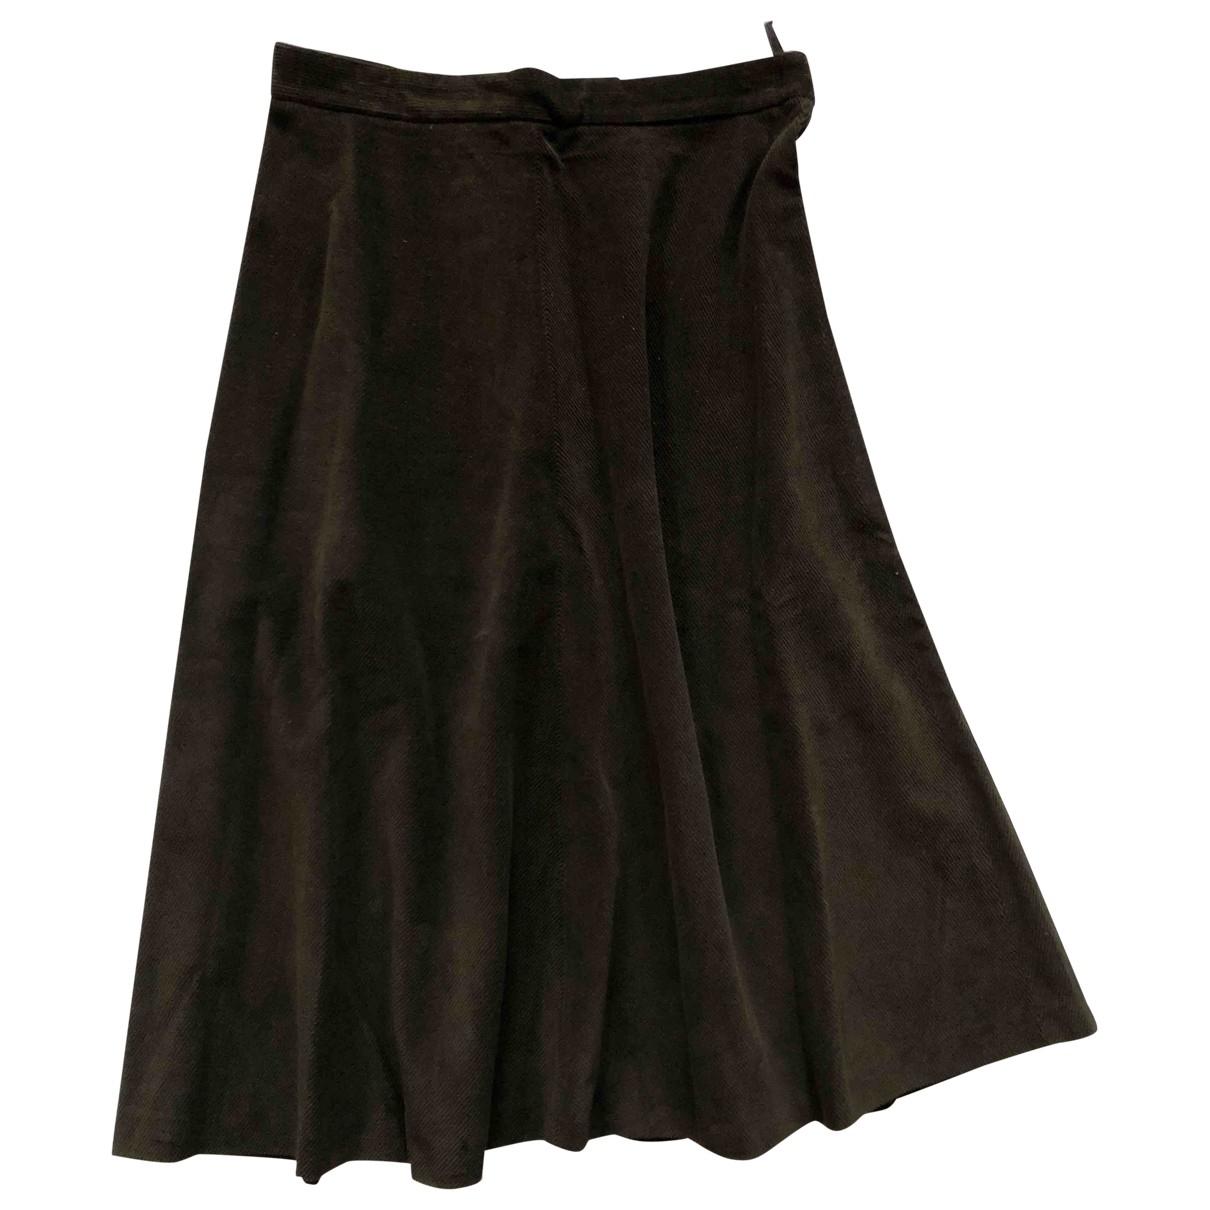 Miu Miu \N Brown Cotton skirt for Women 44 IT